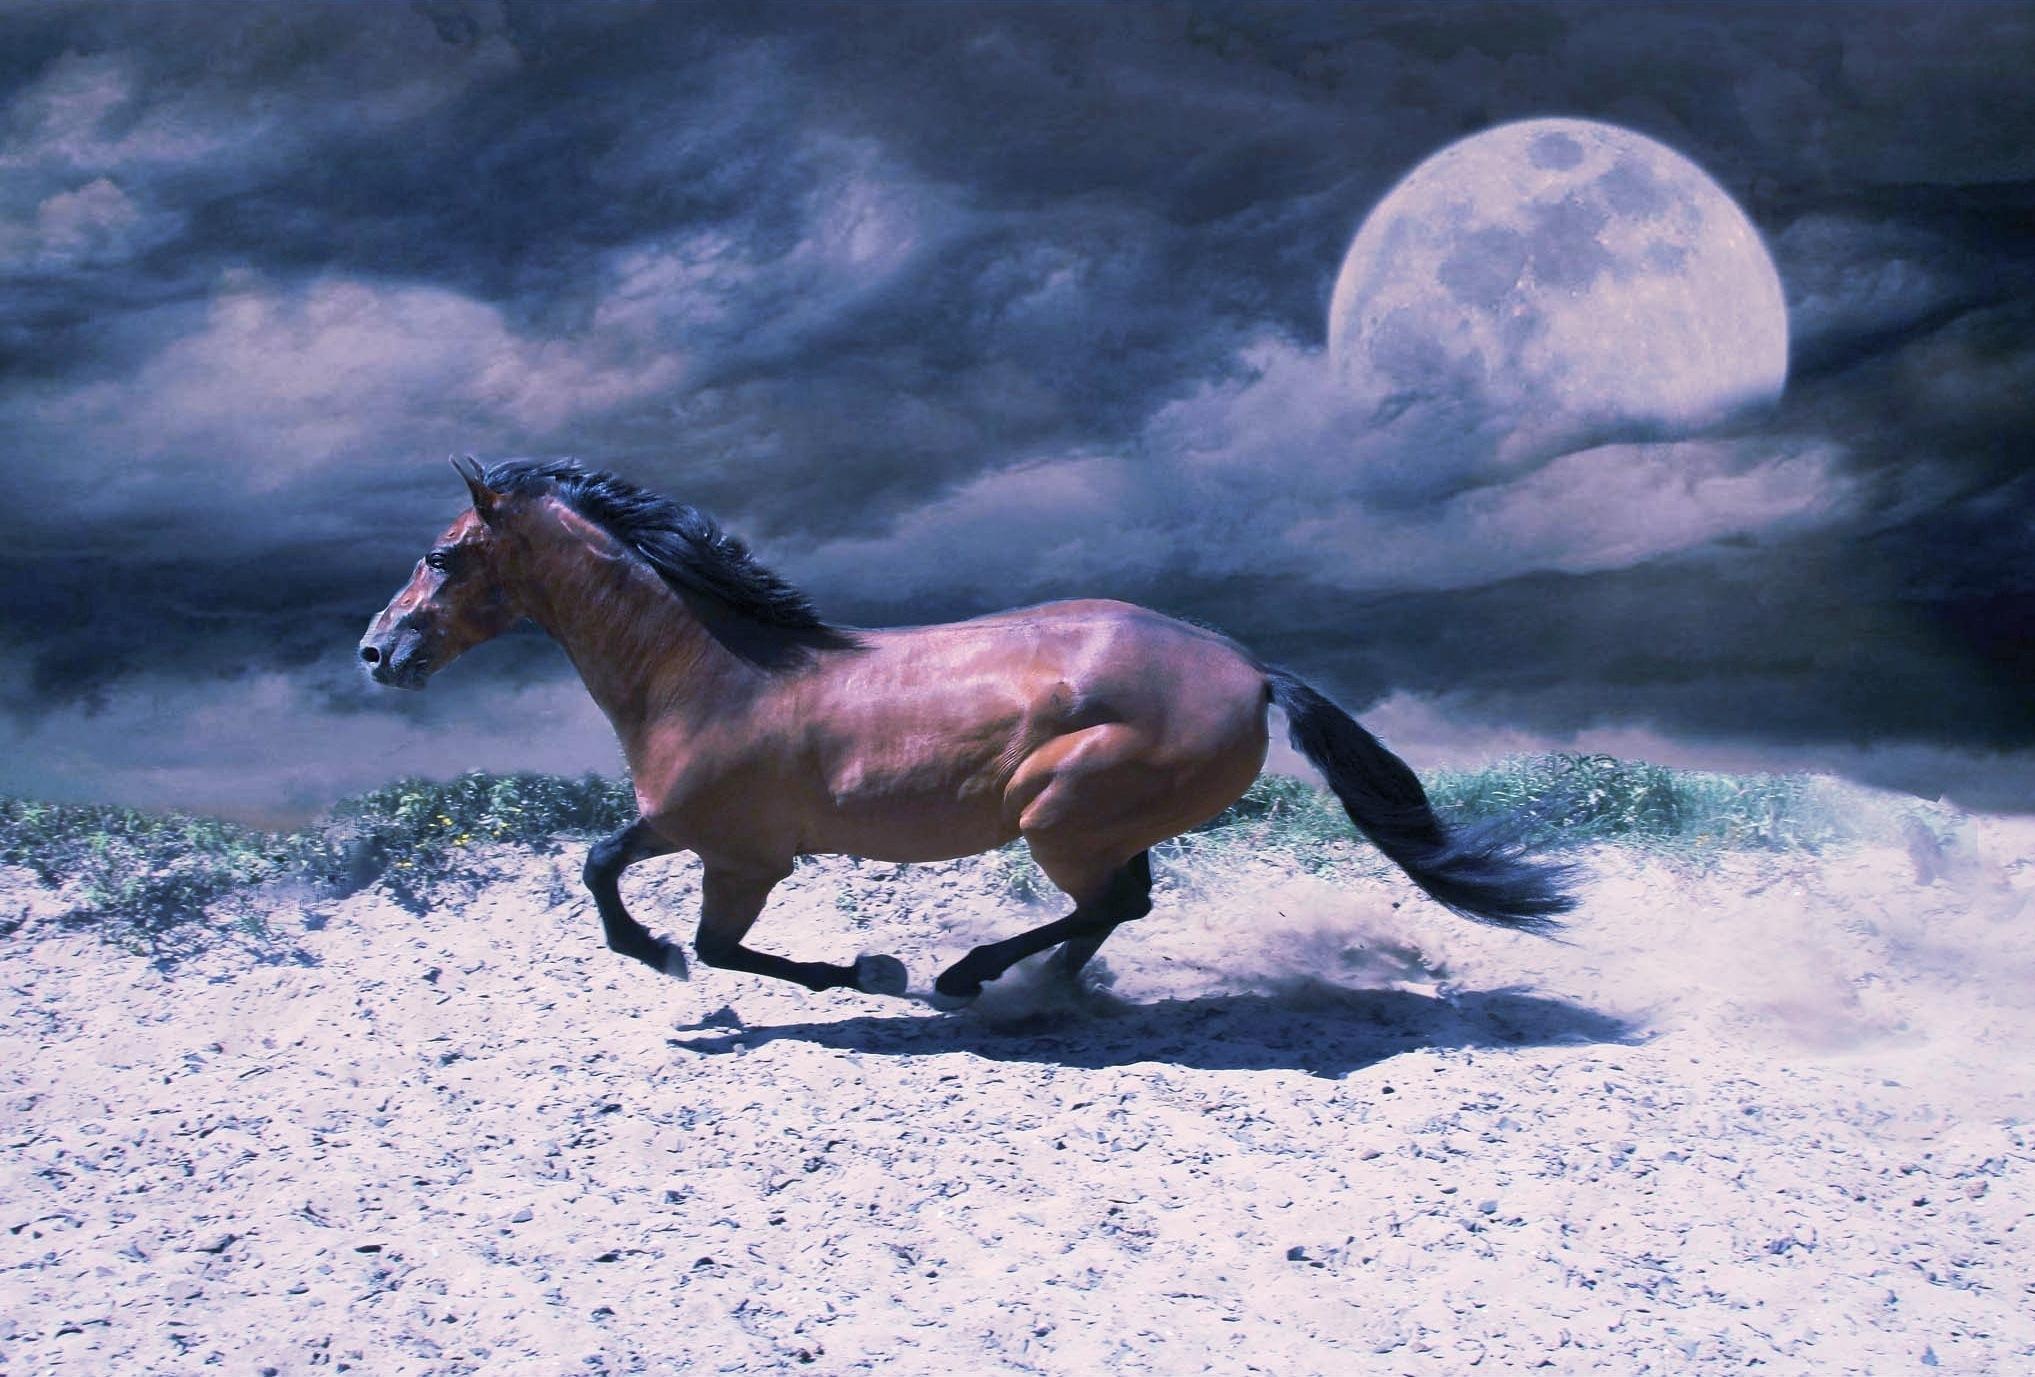 Andalusian horse at moonlight run by Carin Klabbers